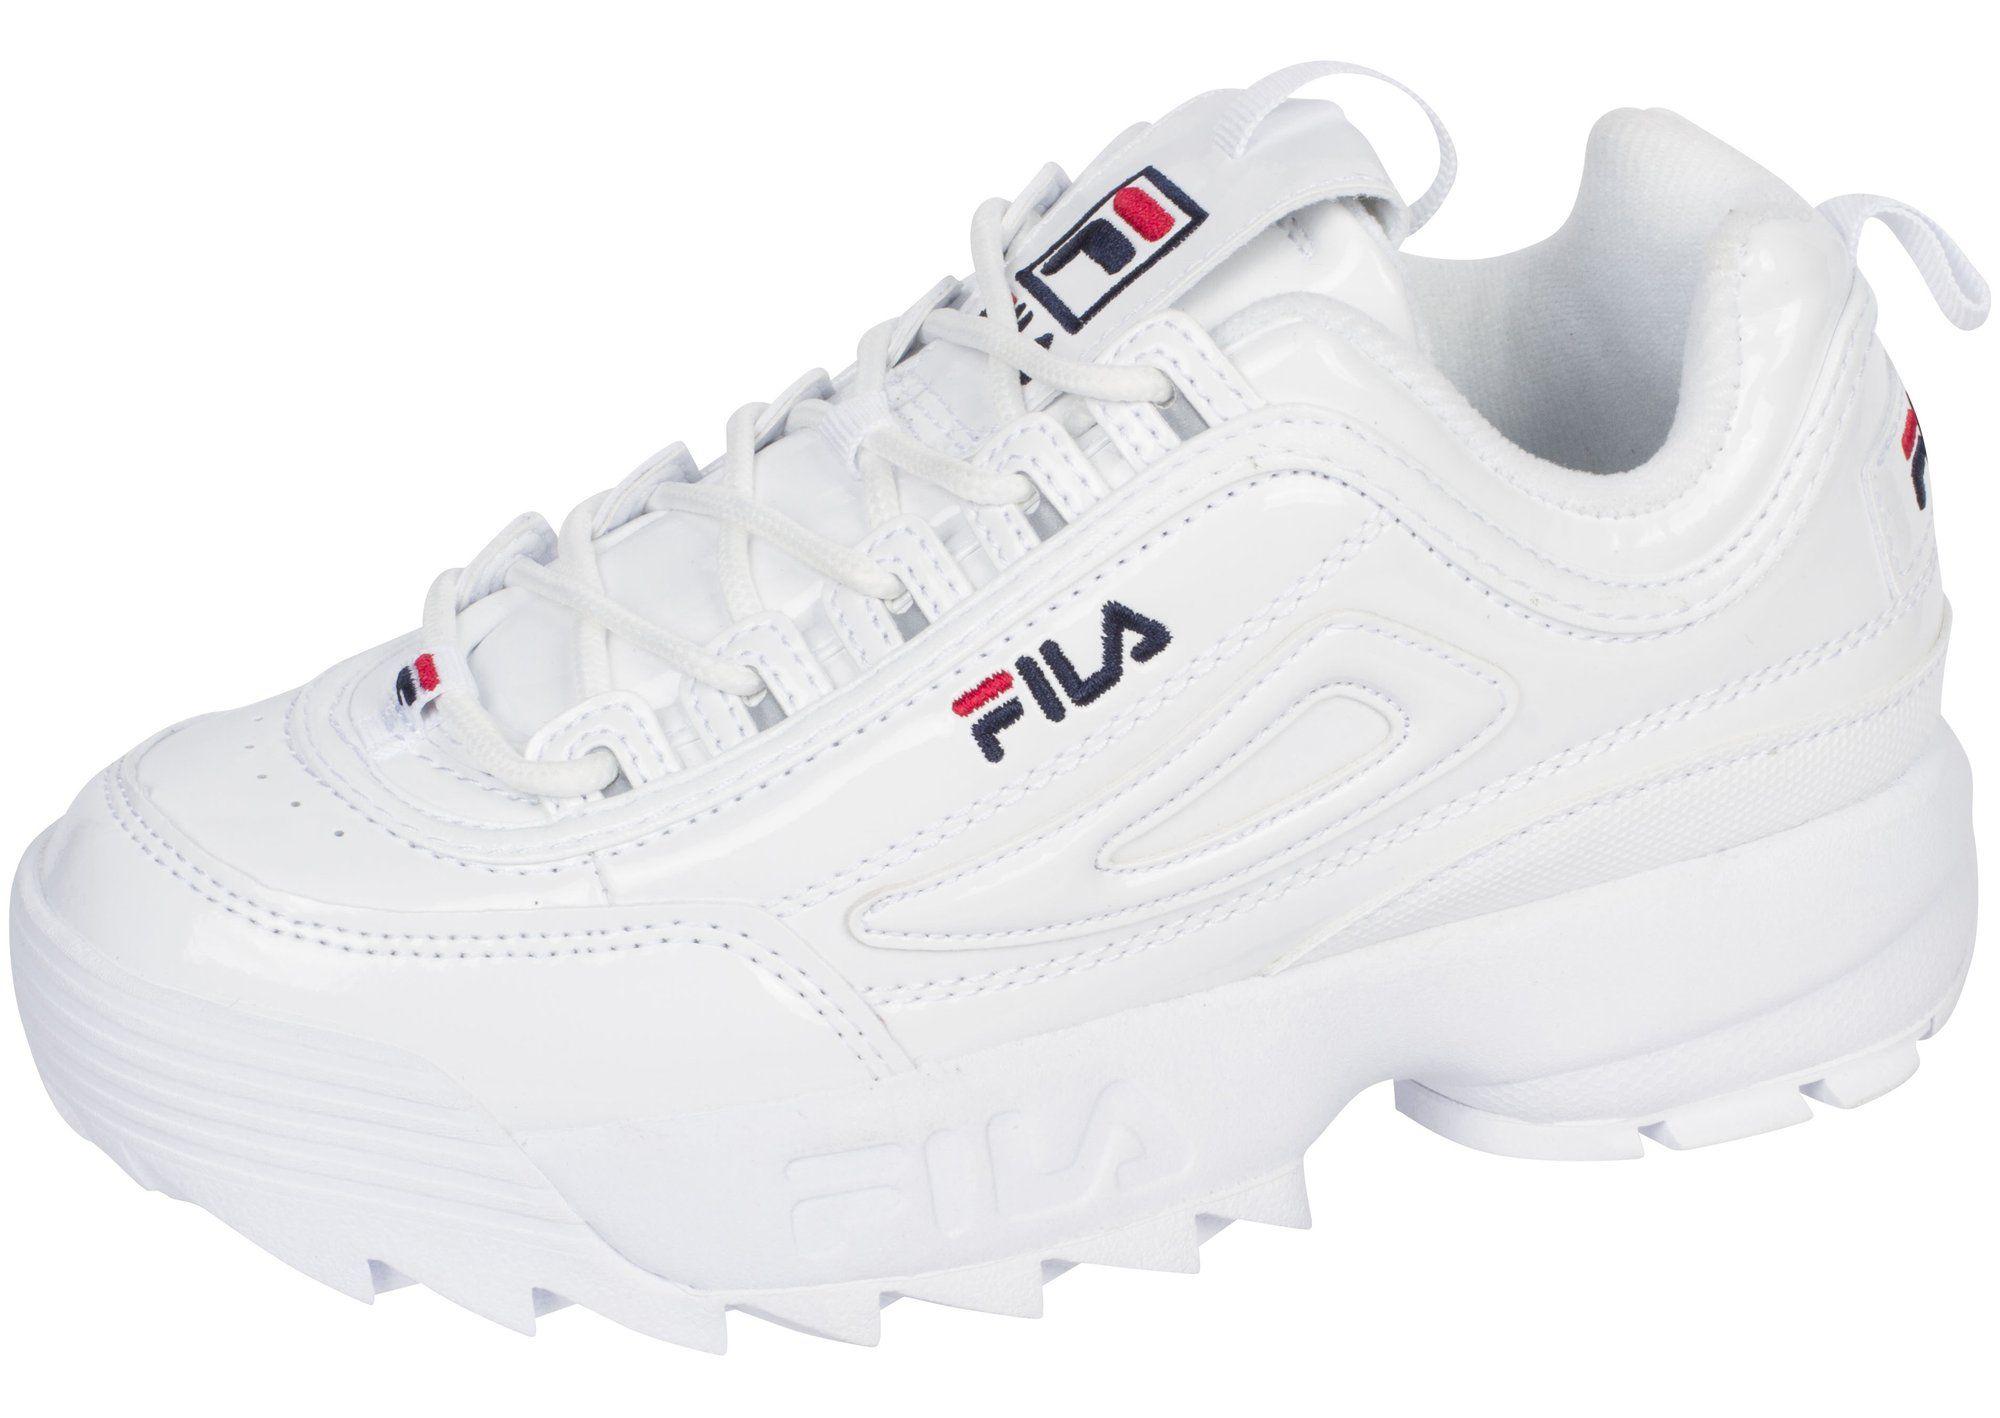 FILA Womens Disruptor II Premium Patent White Fila Navy Fila